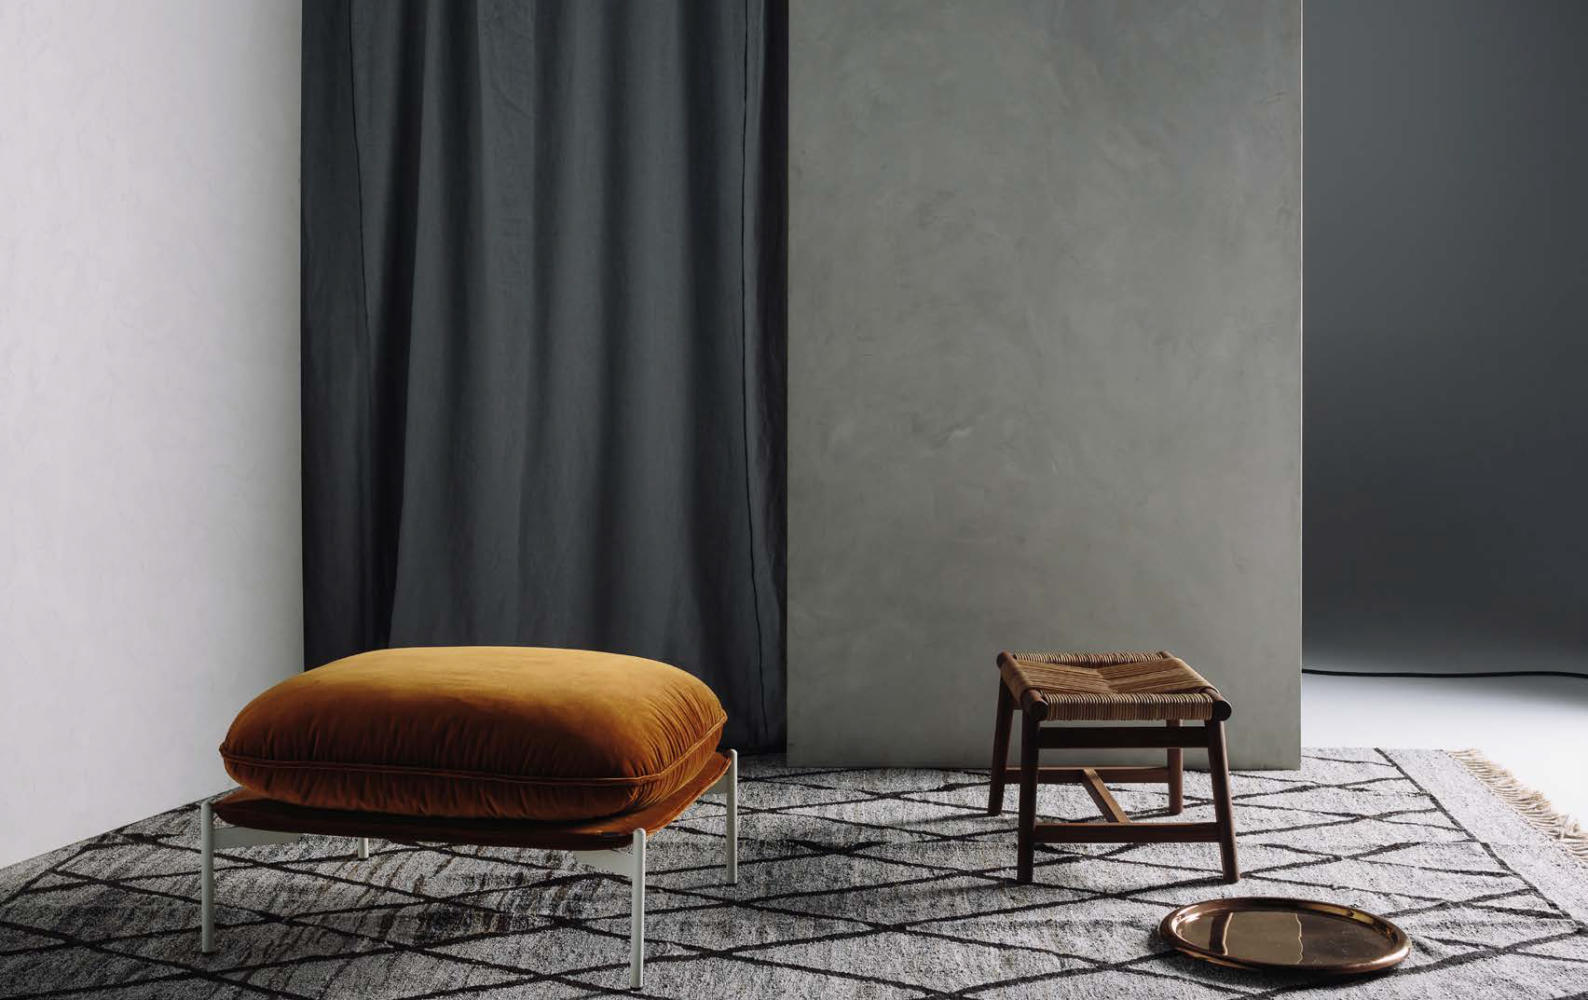 Artisan Flooring, Turkey Rewoven Kilim styled by Home magazine is understated ethnic.